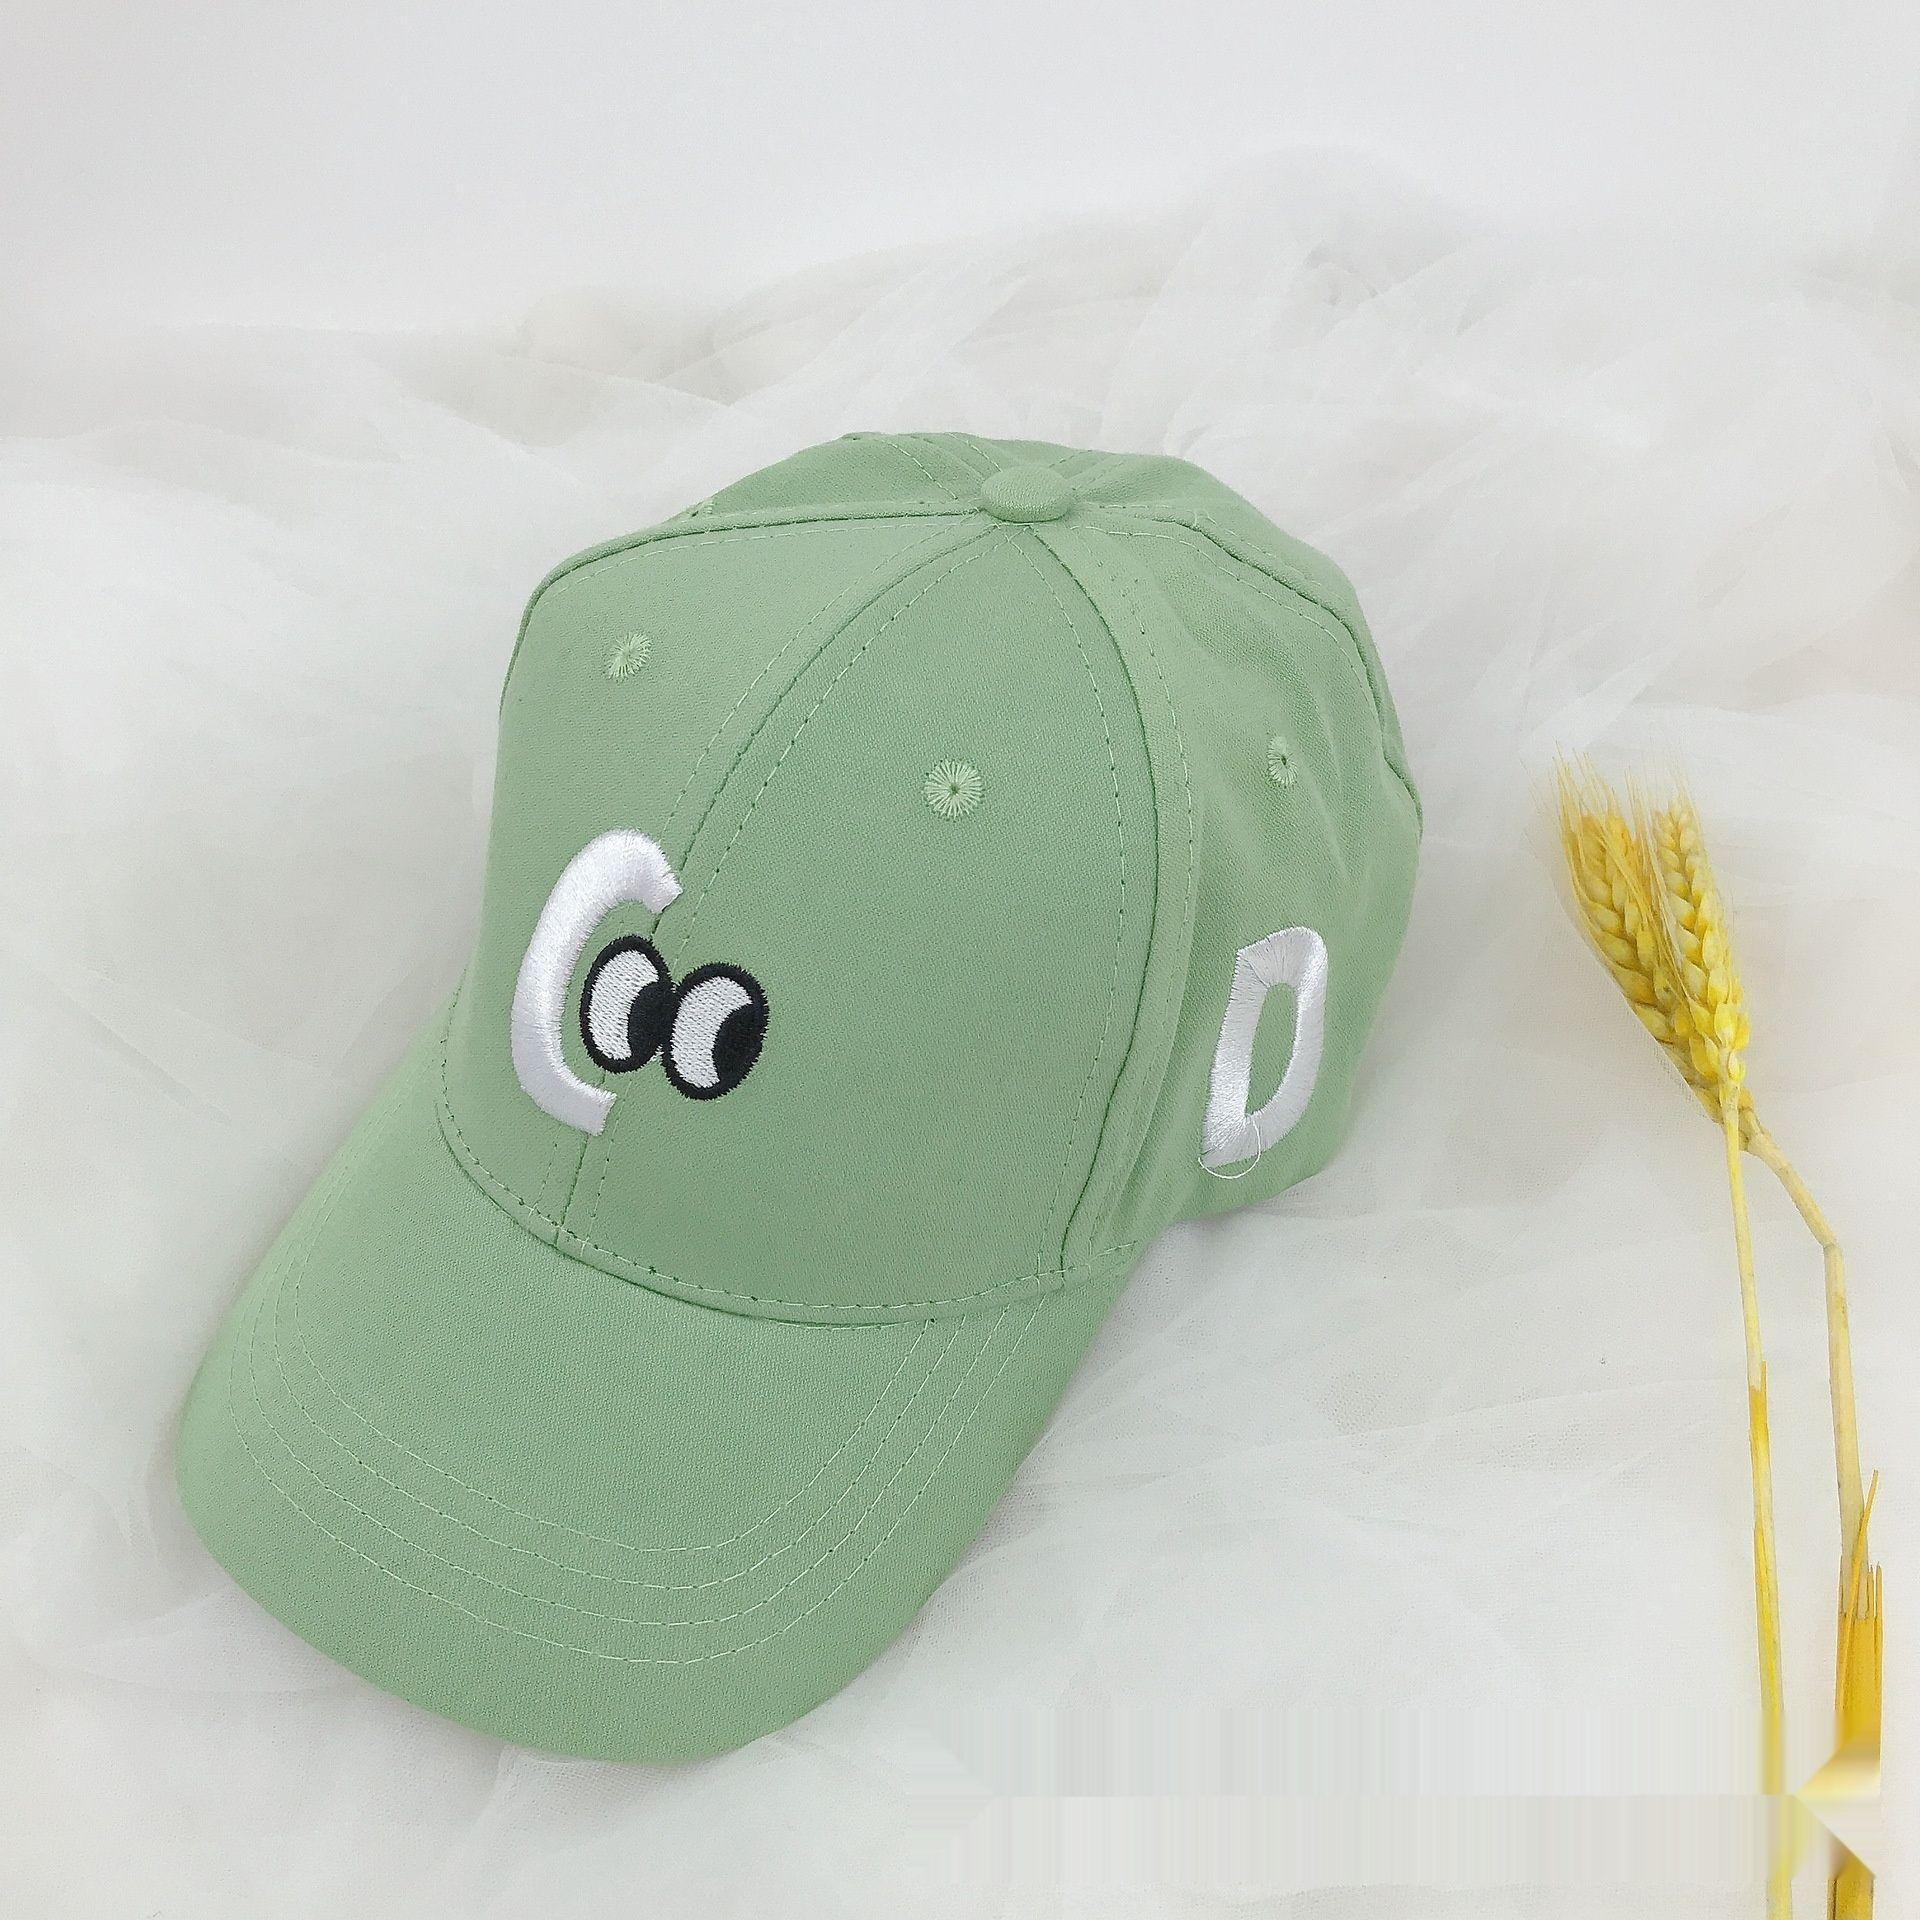 boysletter p2MEe 20 novos infantil bordado Protetor solar capBaseball boné de beisebol capcap girlsbaby chapéu protetor solar fina